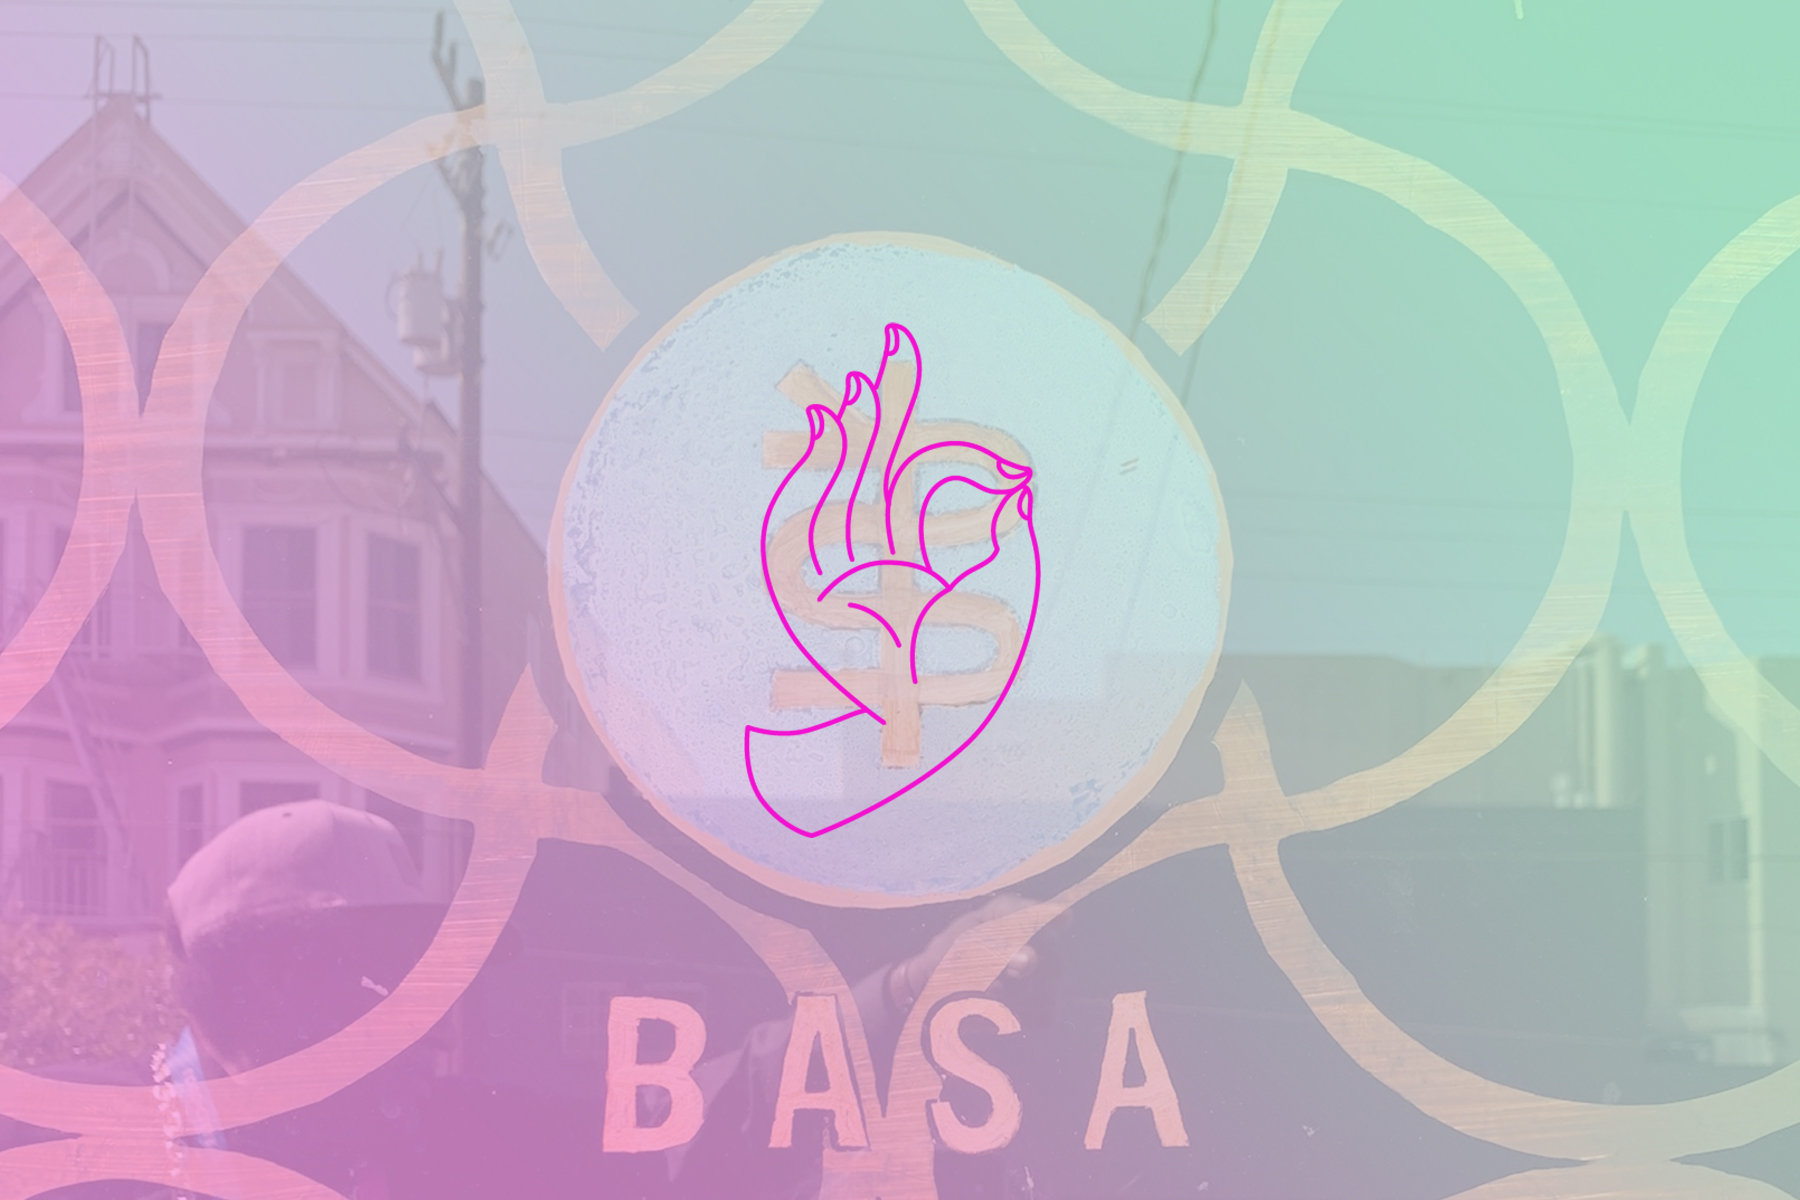 Basa_R_gr.jpg